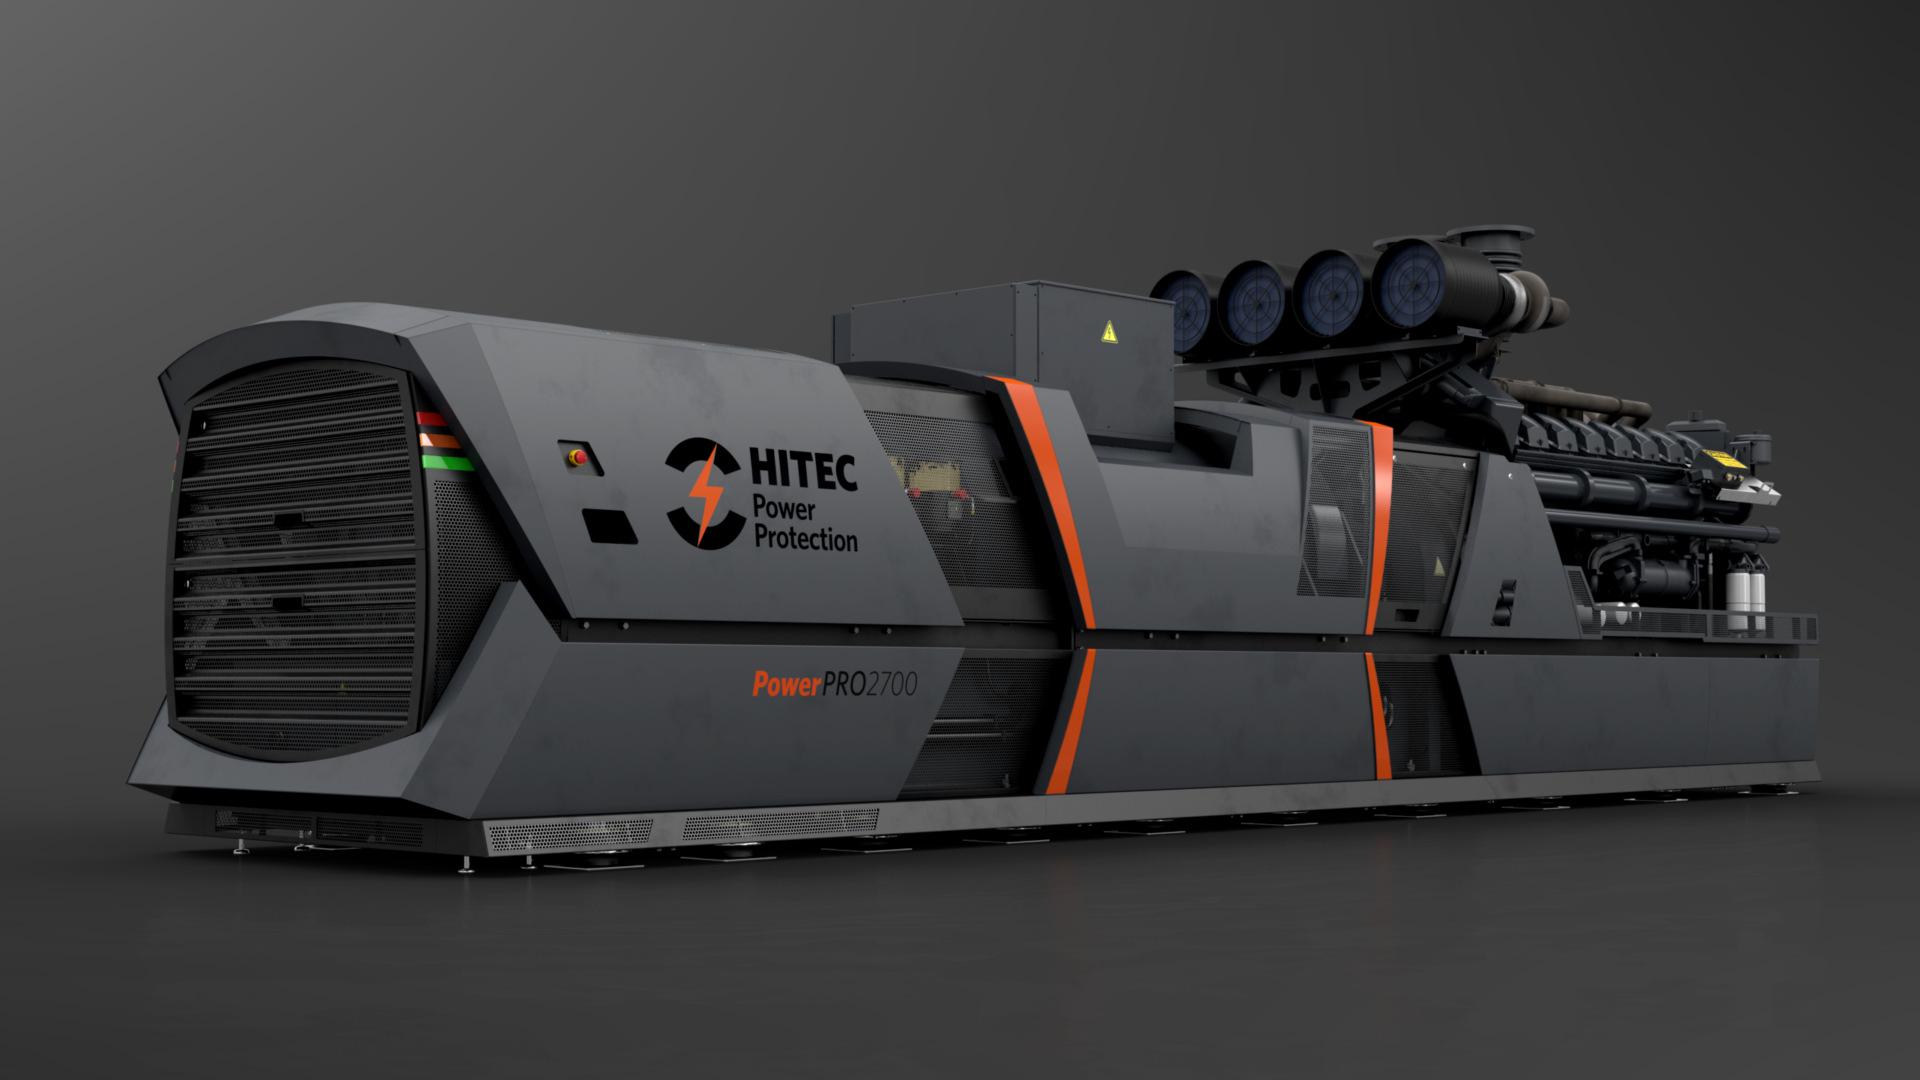 Technical Animation case | Hitec UPS system